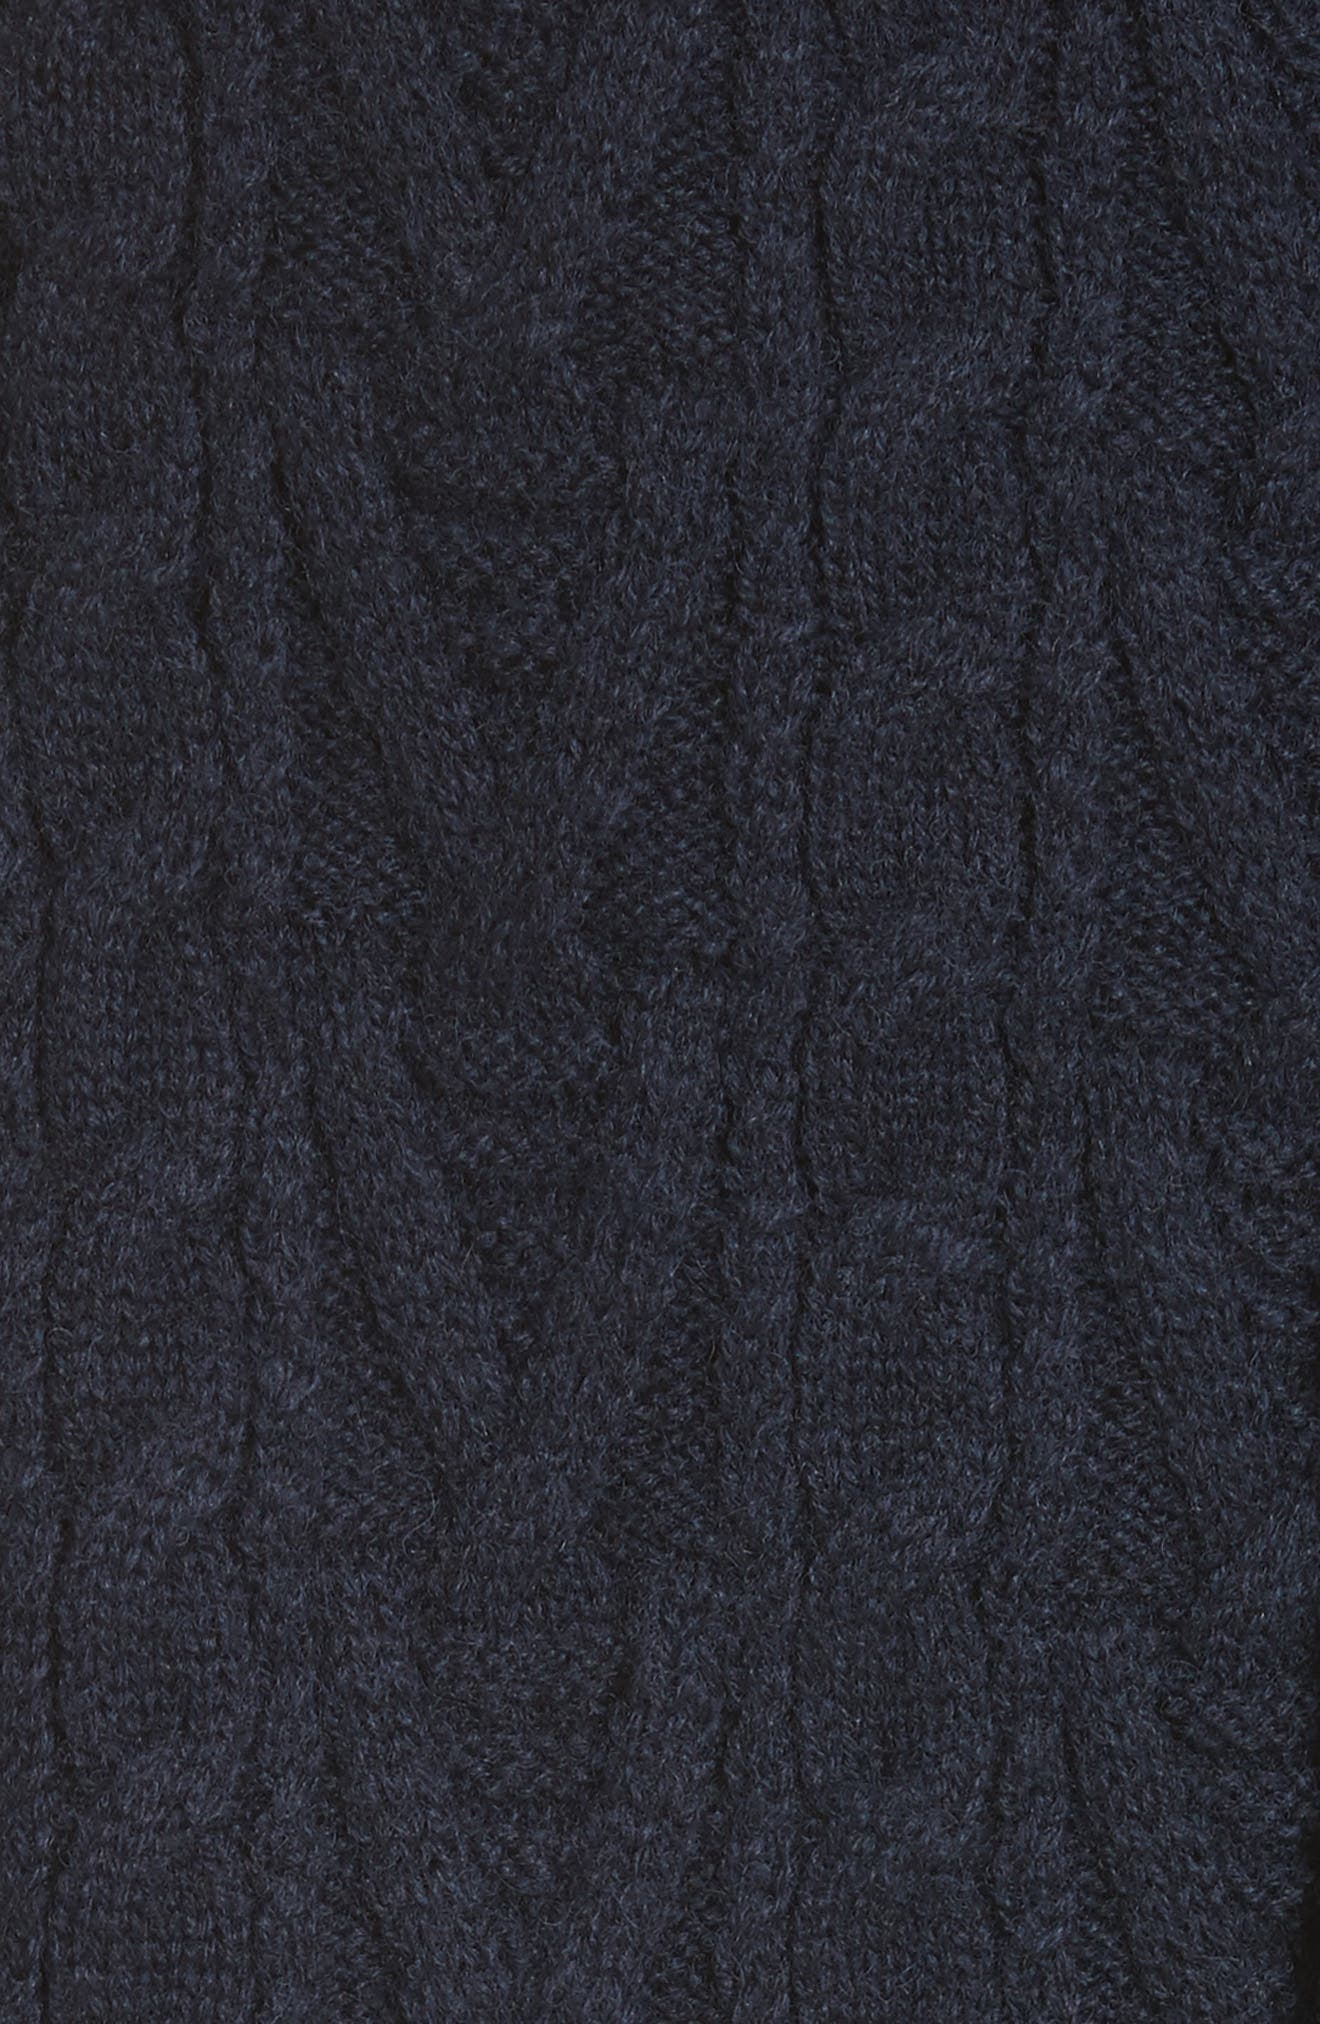 Button Back Stripe Sweater,                             Alternate thumbnail 5, color,                             410